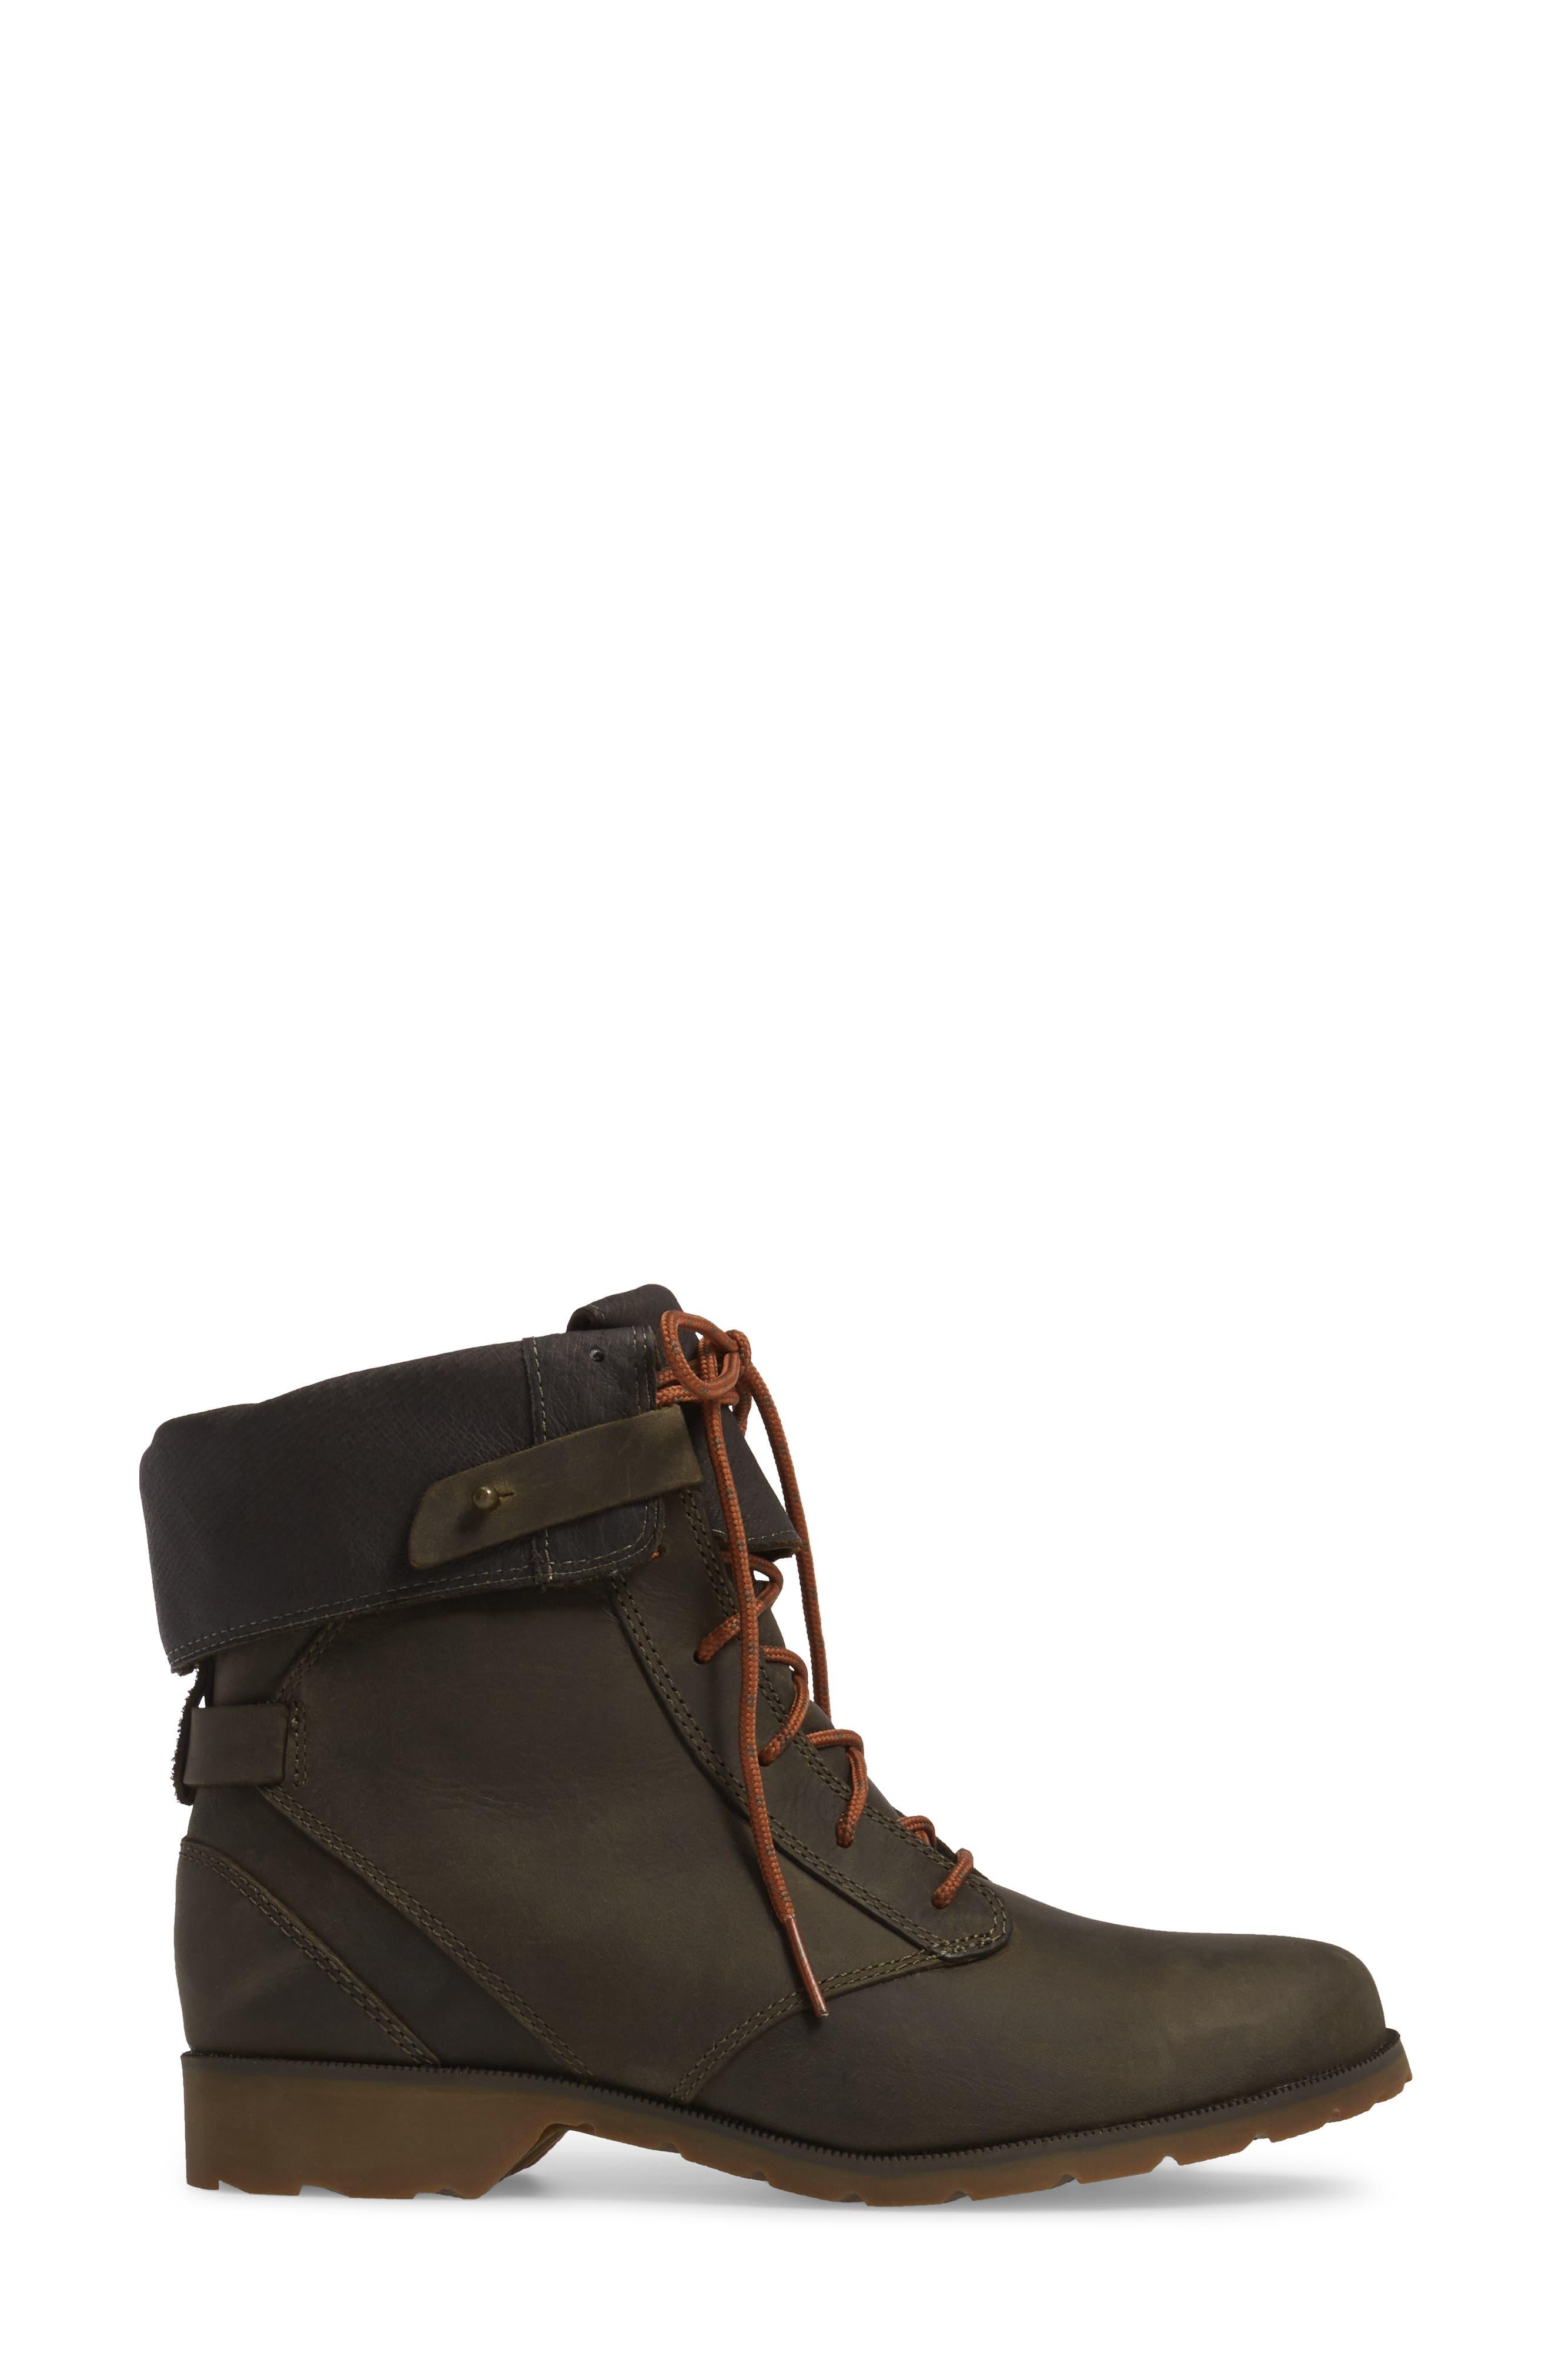 'De La Vina' Waterproof Lace-Up Boot,                             Alternate thumbnail 3, color,                             Dark Olive Leather